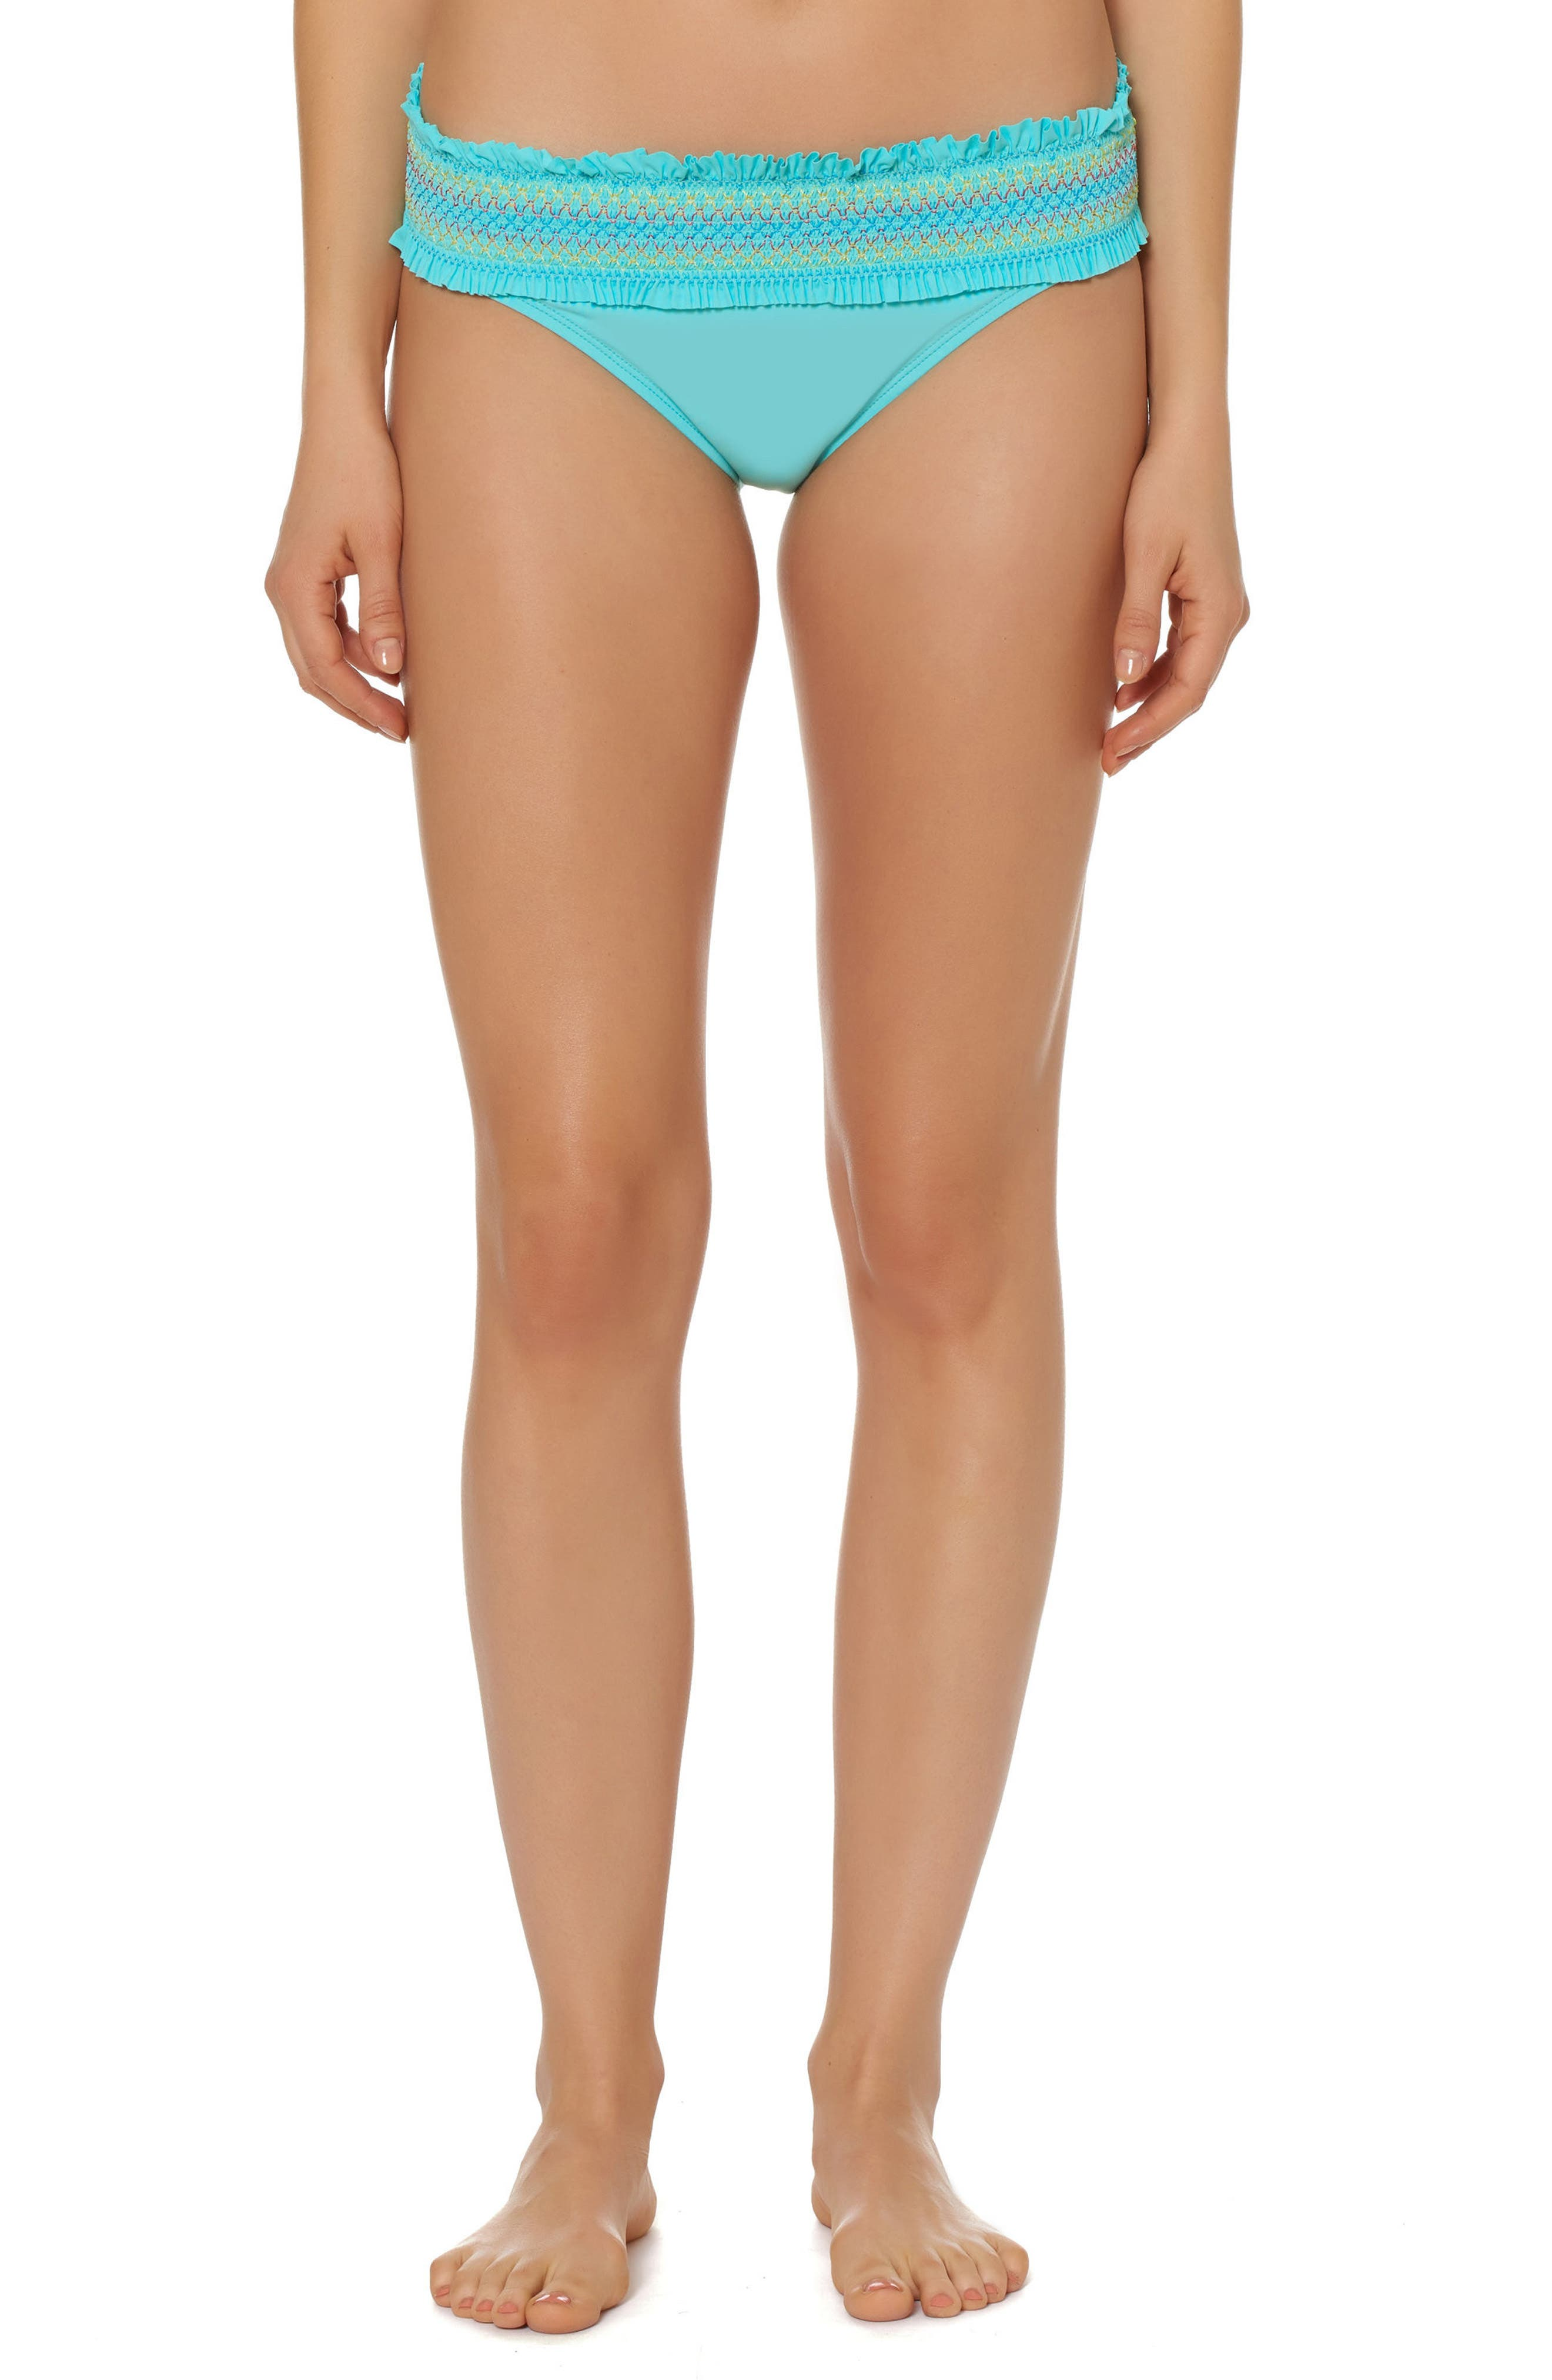 Bleu by Rod Beattie Smocked Hipster Bikini Bottoms,                         Main,                         color, Bleu Fish